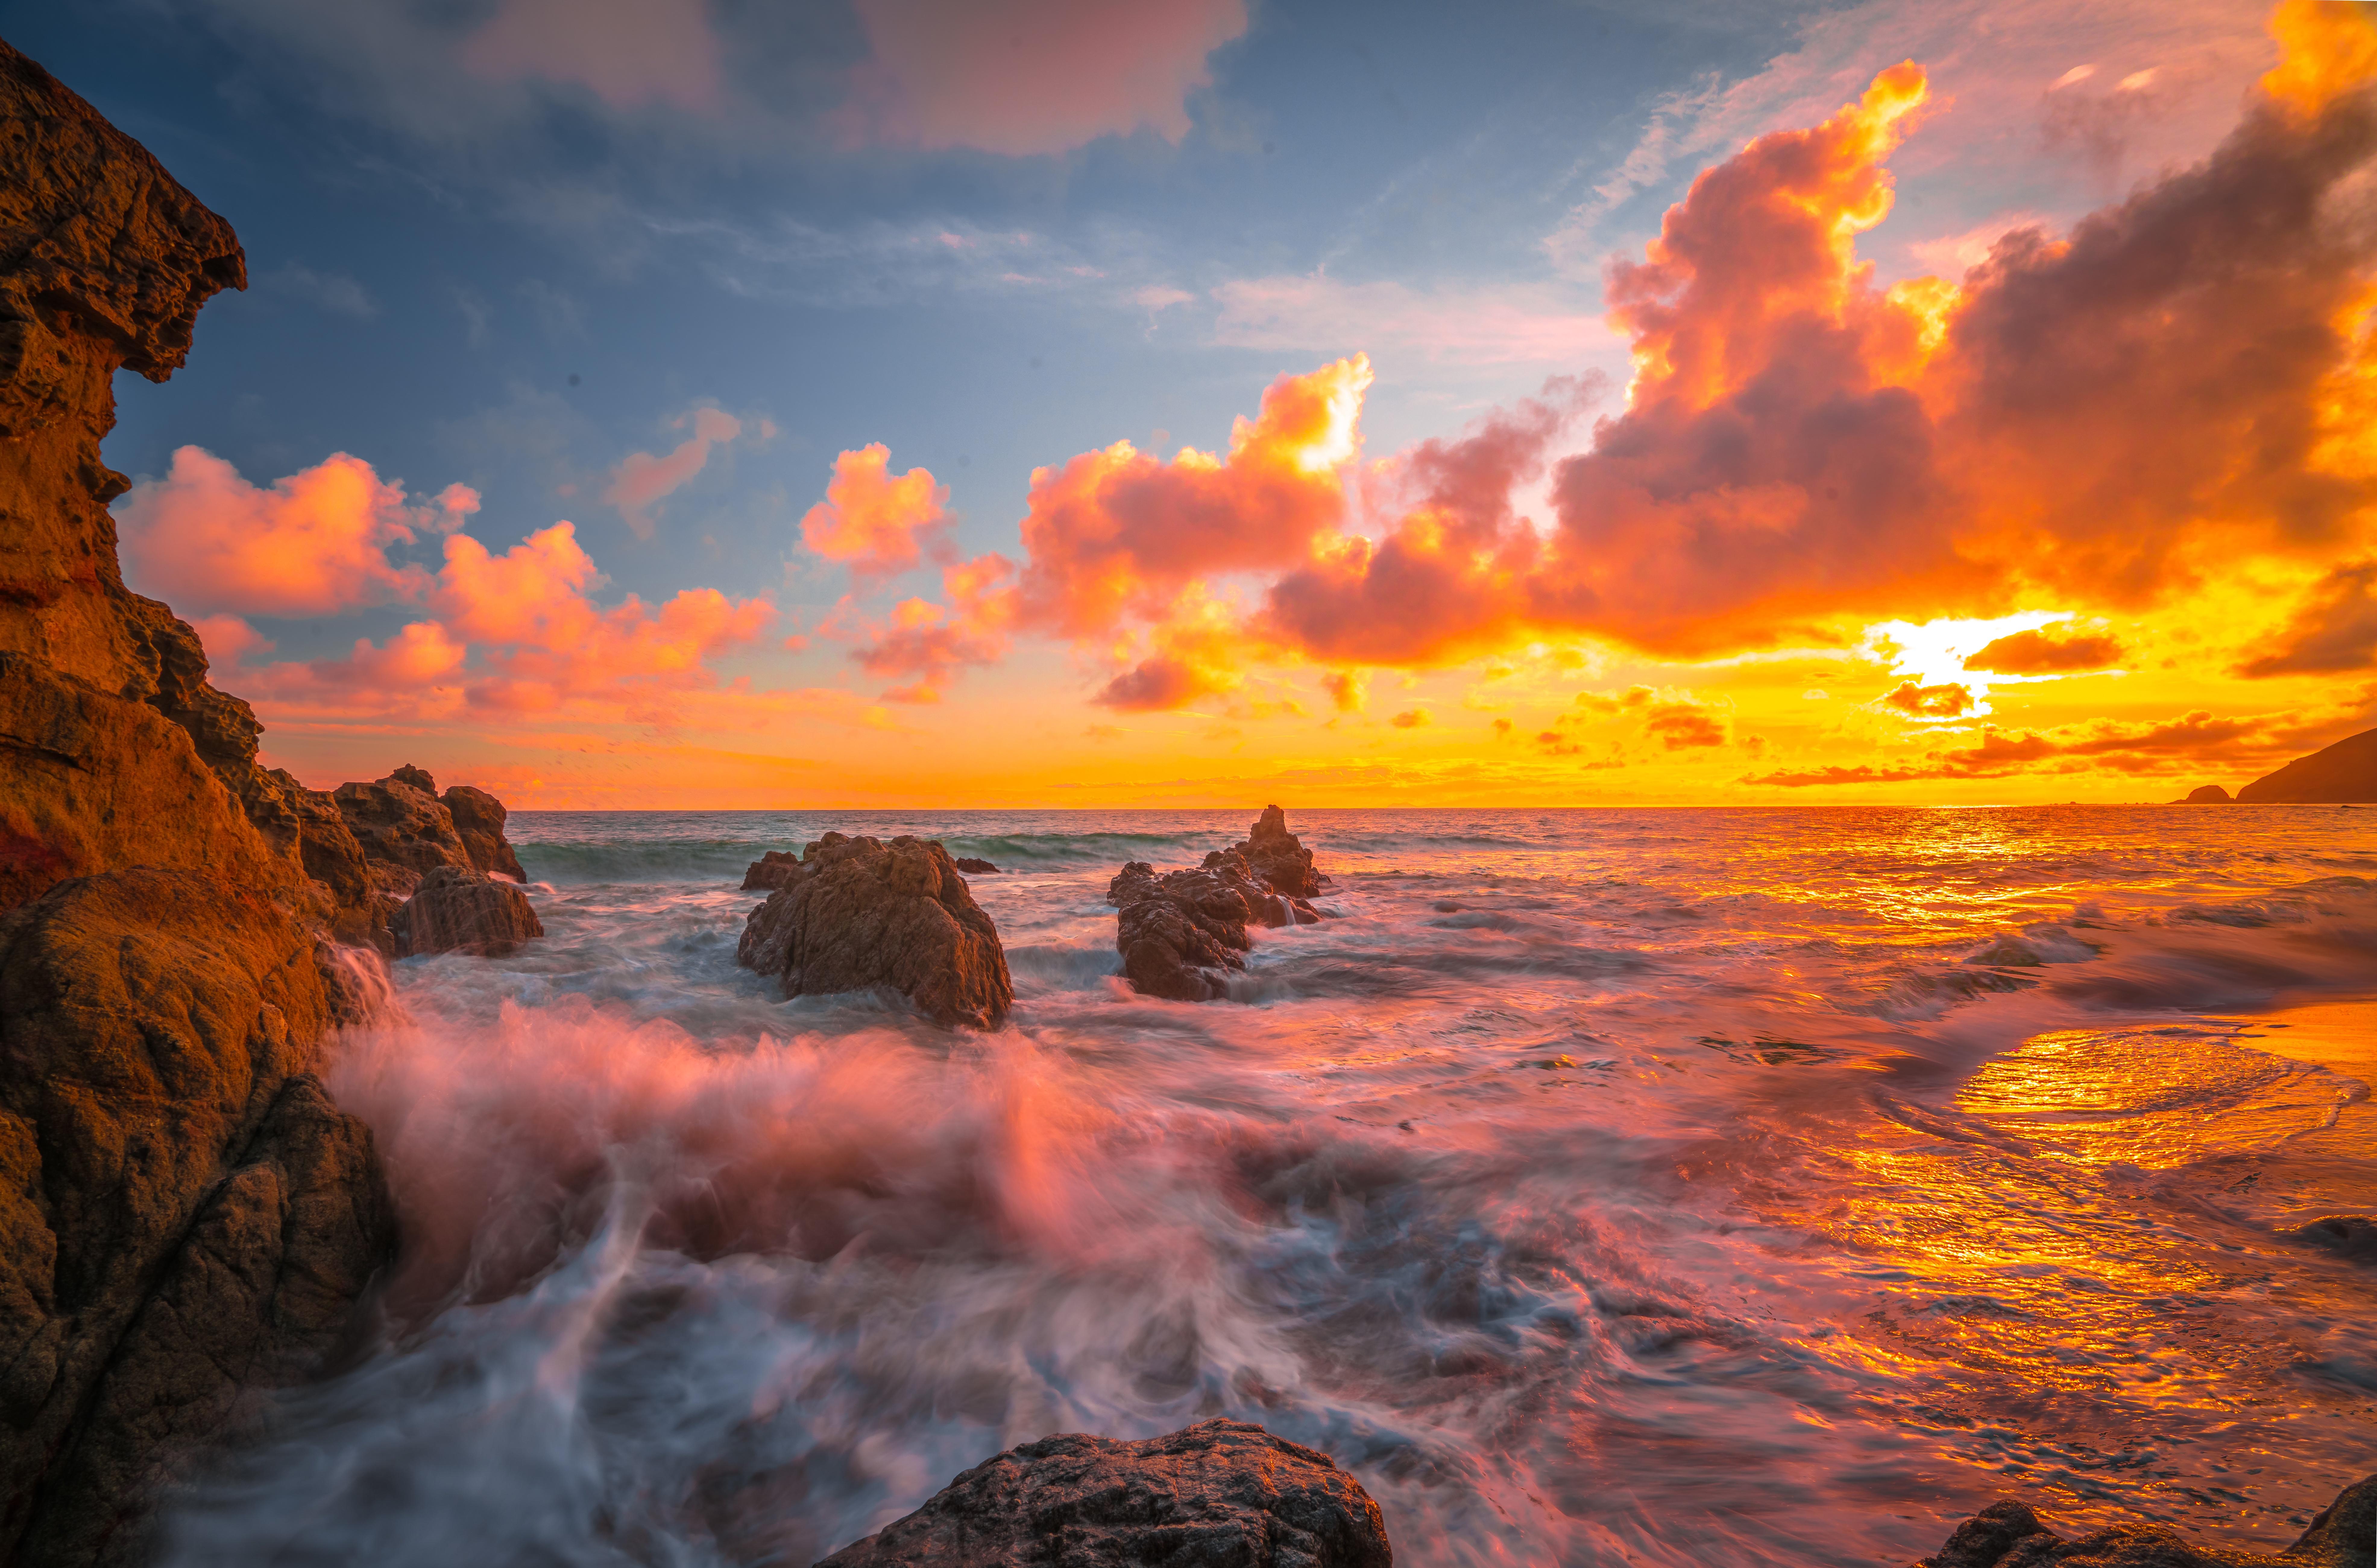 8k Animal Wallpaper Download: 3840x2160 Ocean Sunset 8k 4k HD 4k Wallpapers, Images